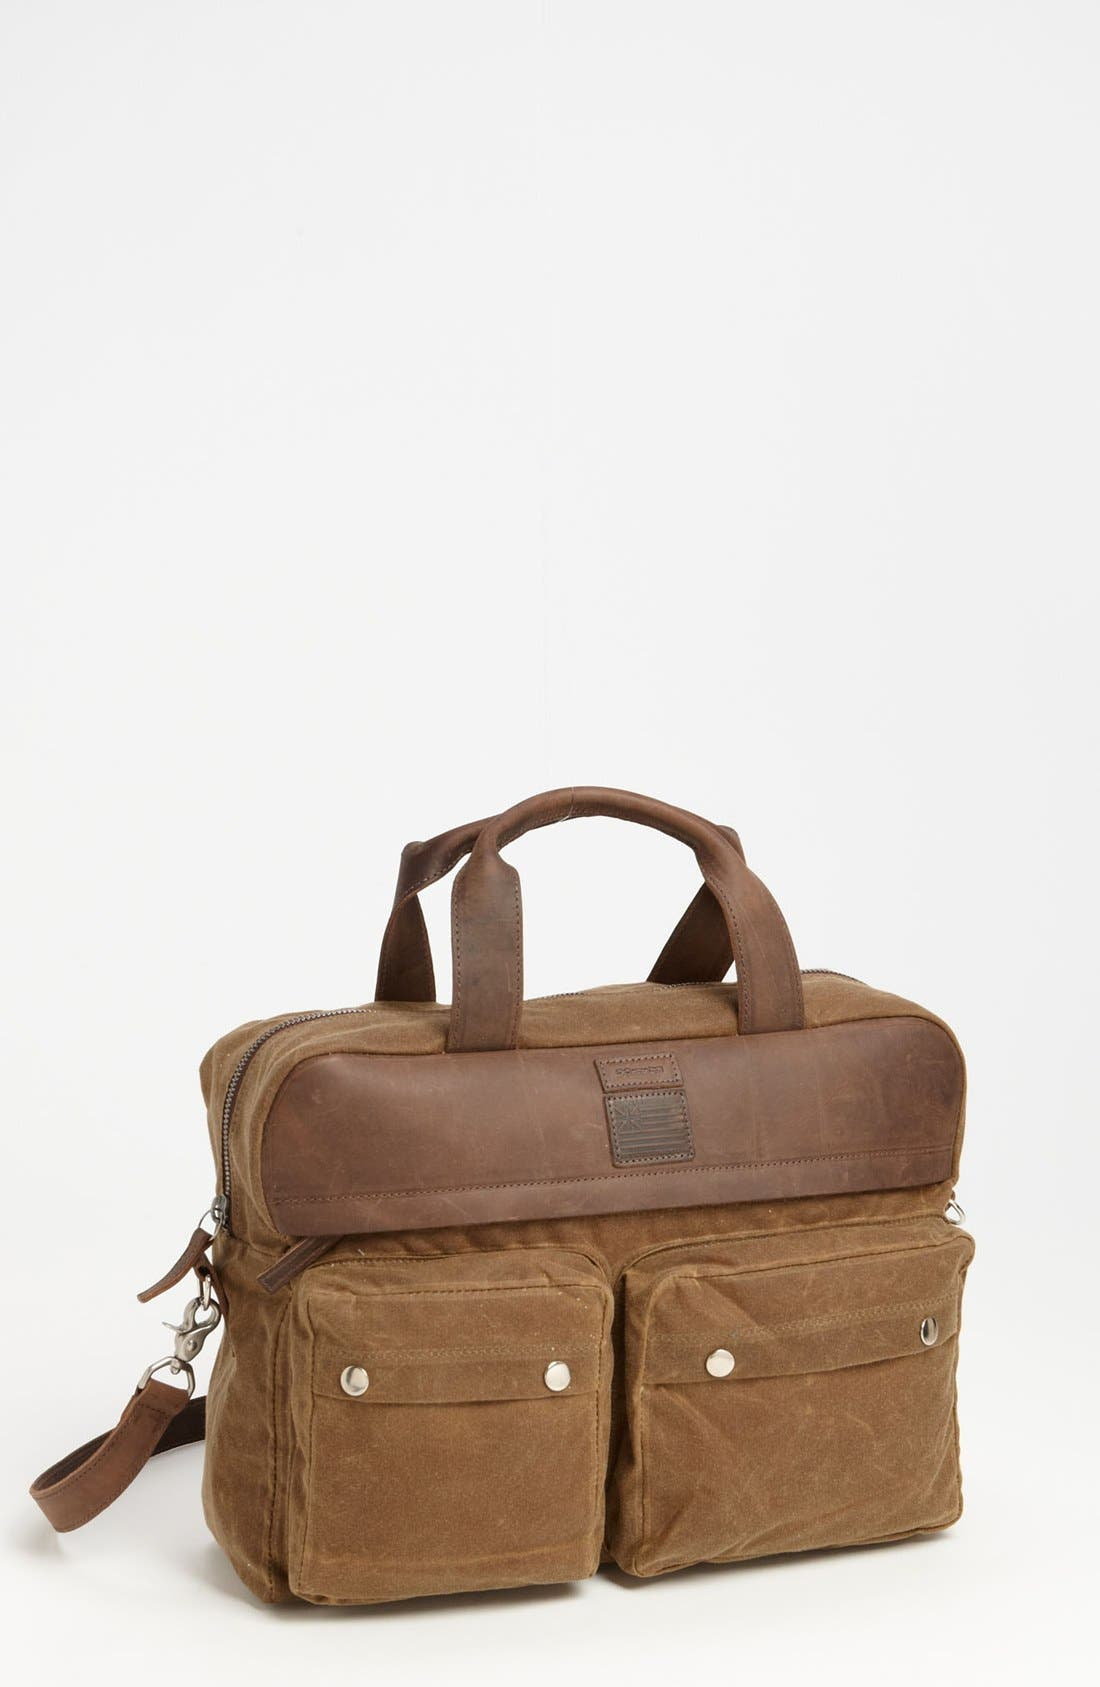 Main Image - Insubordinate Lads 'Spencer' Laptop Briefcase